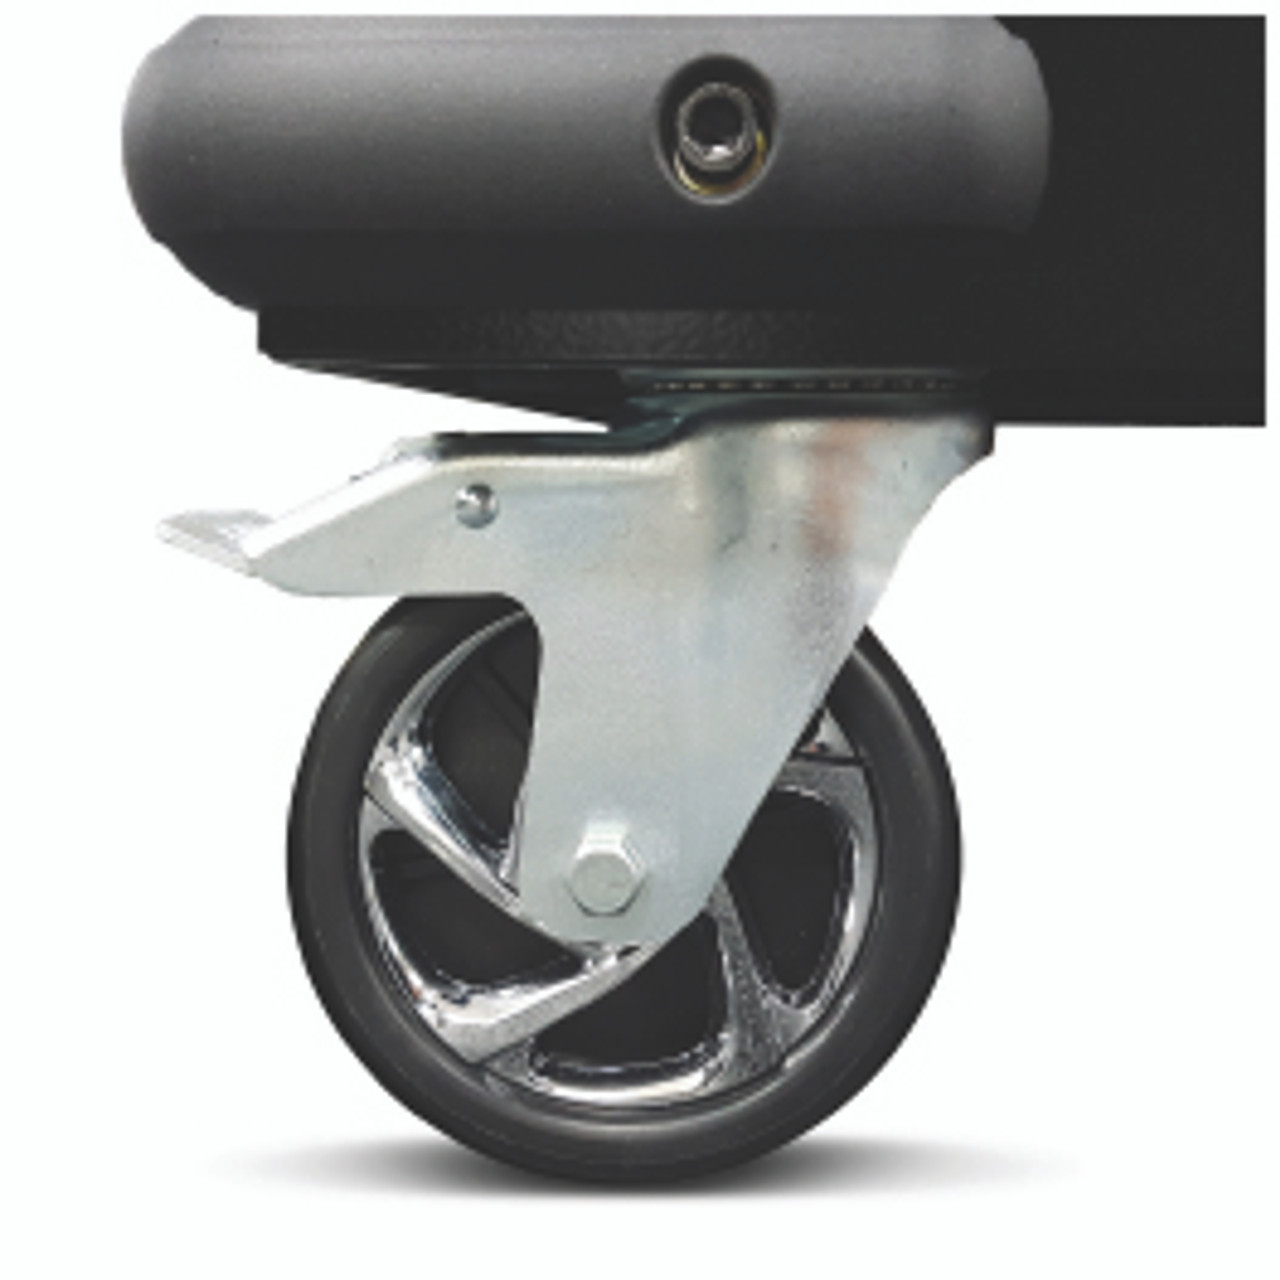 Gearwrench 89901 tool trolley wheel